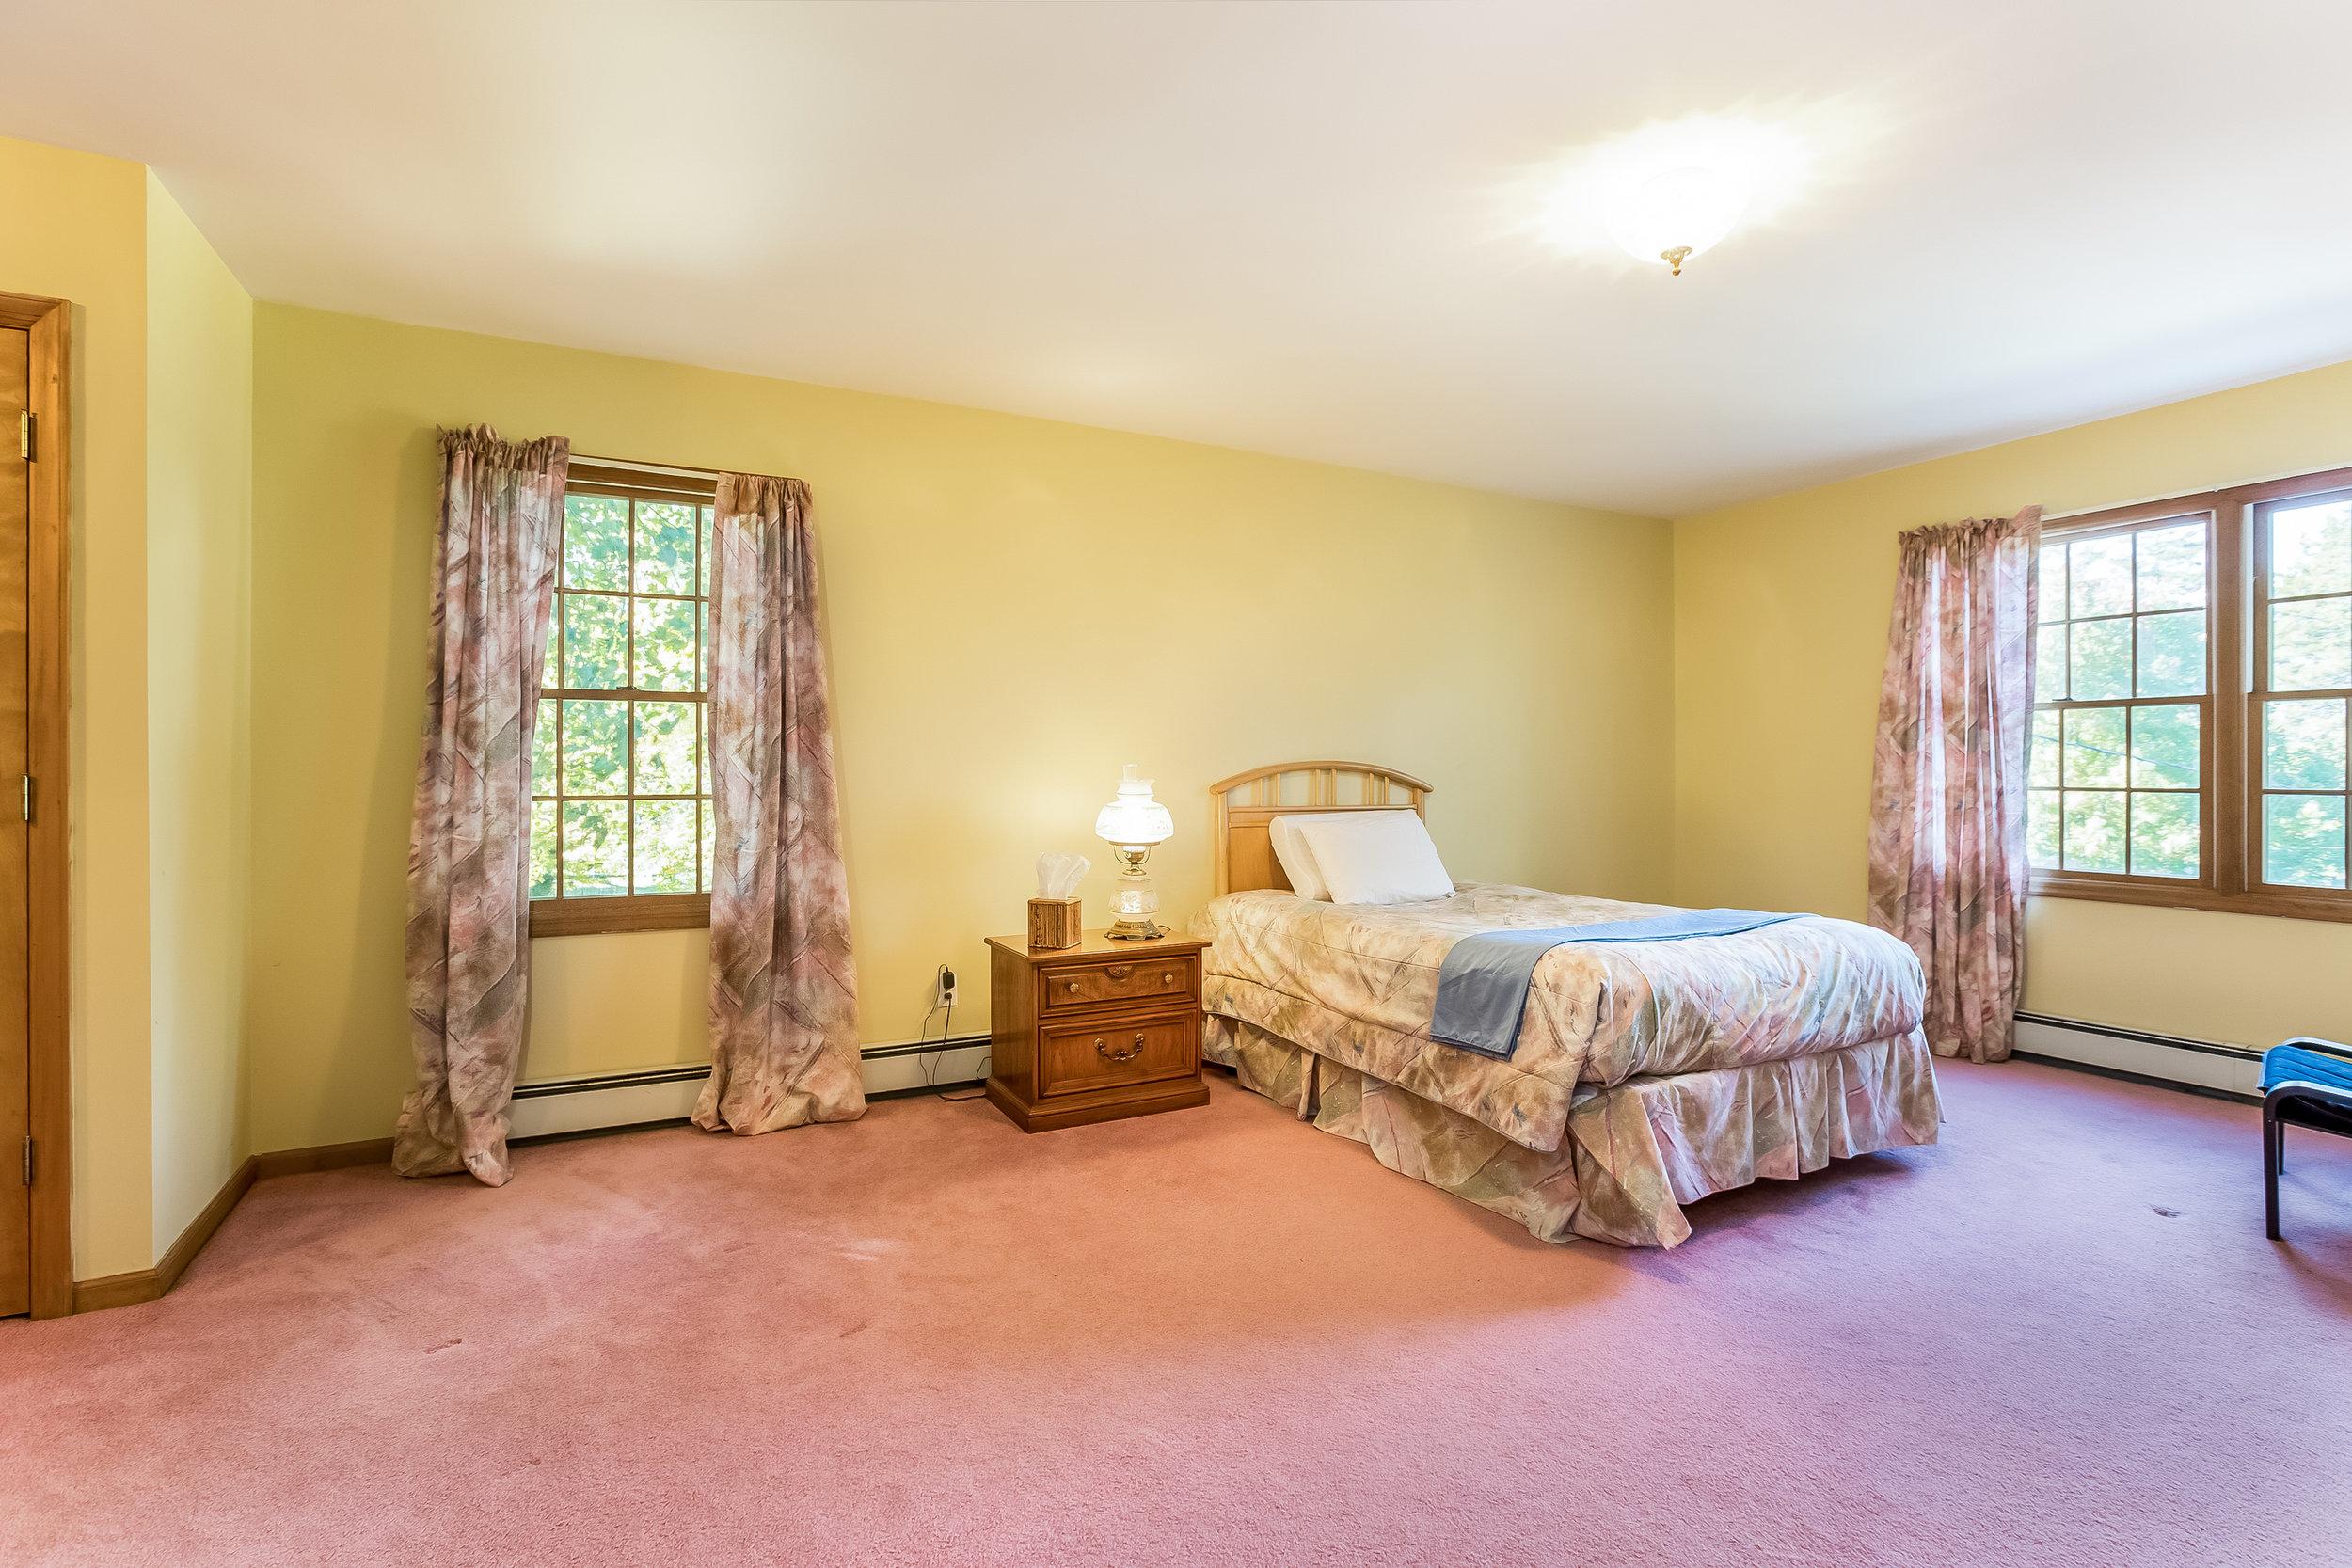 028-Master_Bedroom-5002168-large.jpg